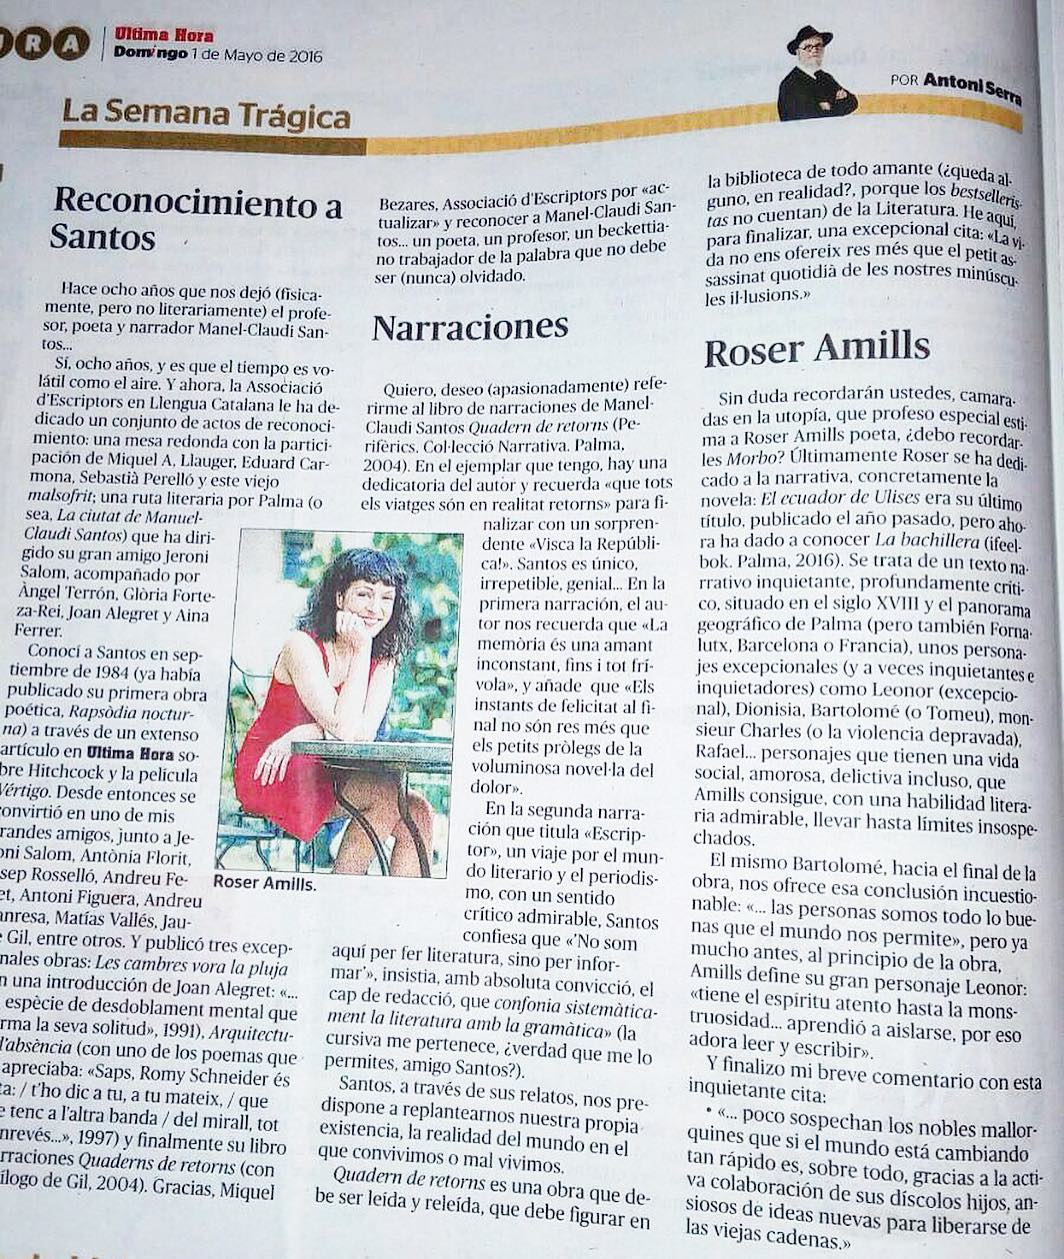 Aquí tenéis lo que dice el gran escritor mallorquín Antoni Serra de mi novela La bachillera